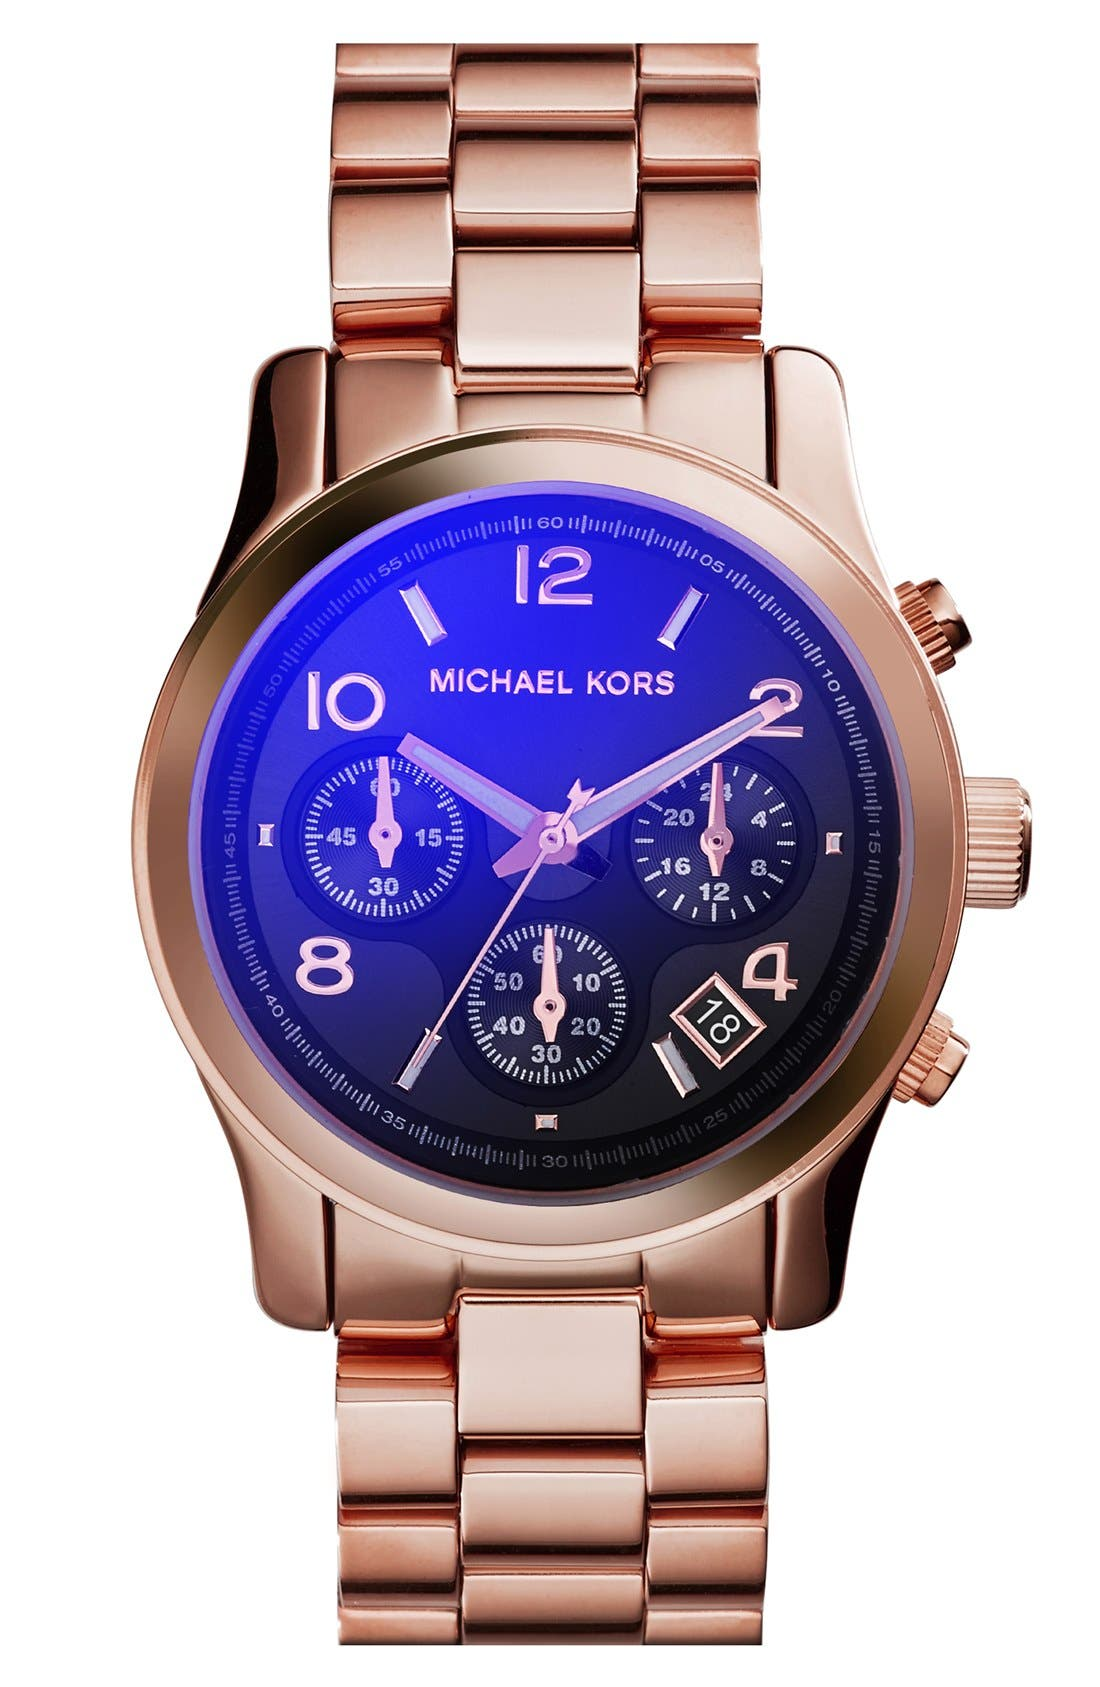 Main Image - Michael Kors 'Runway' Rose Gold Plated Watch, 37mm